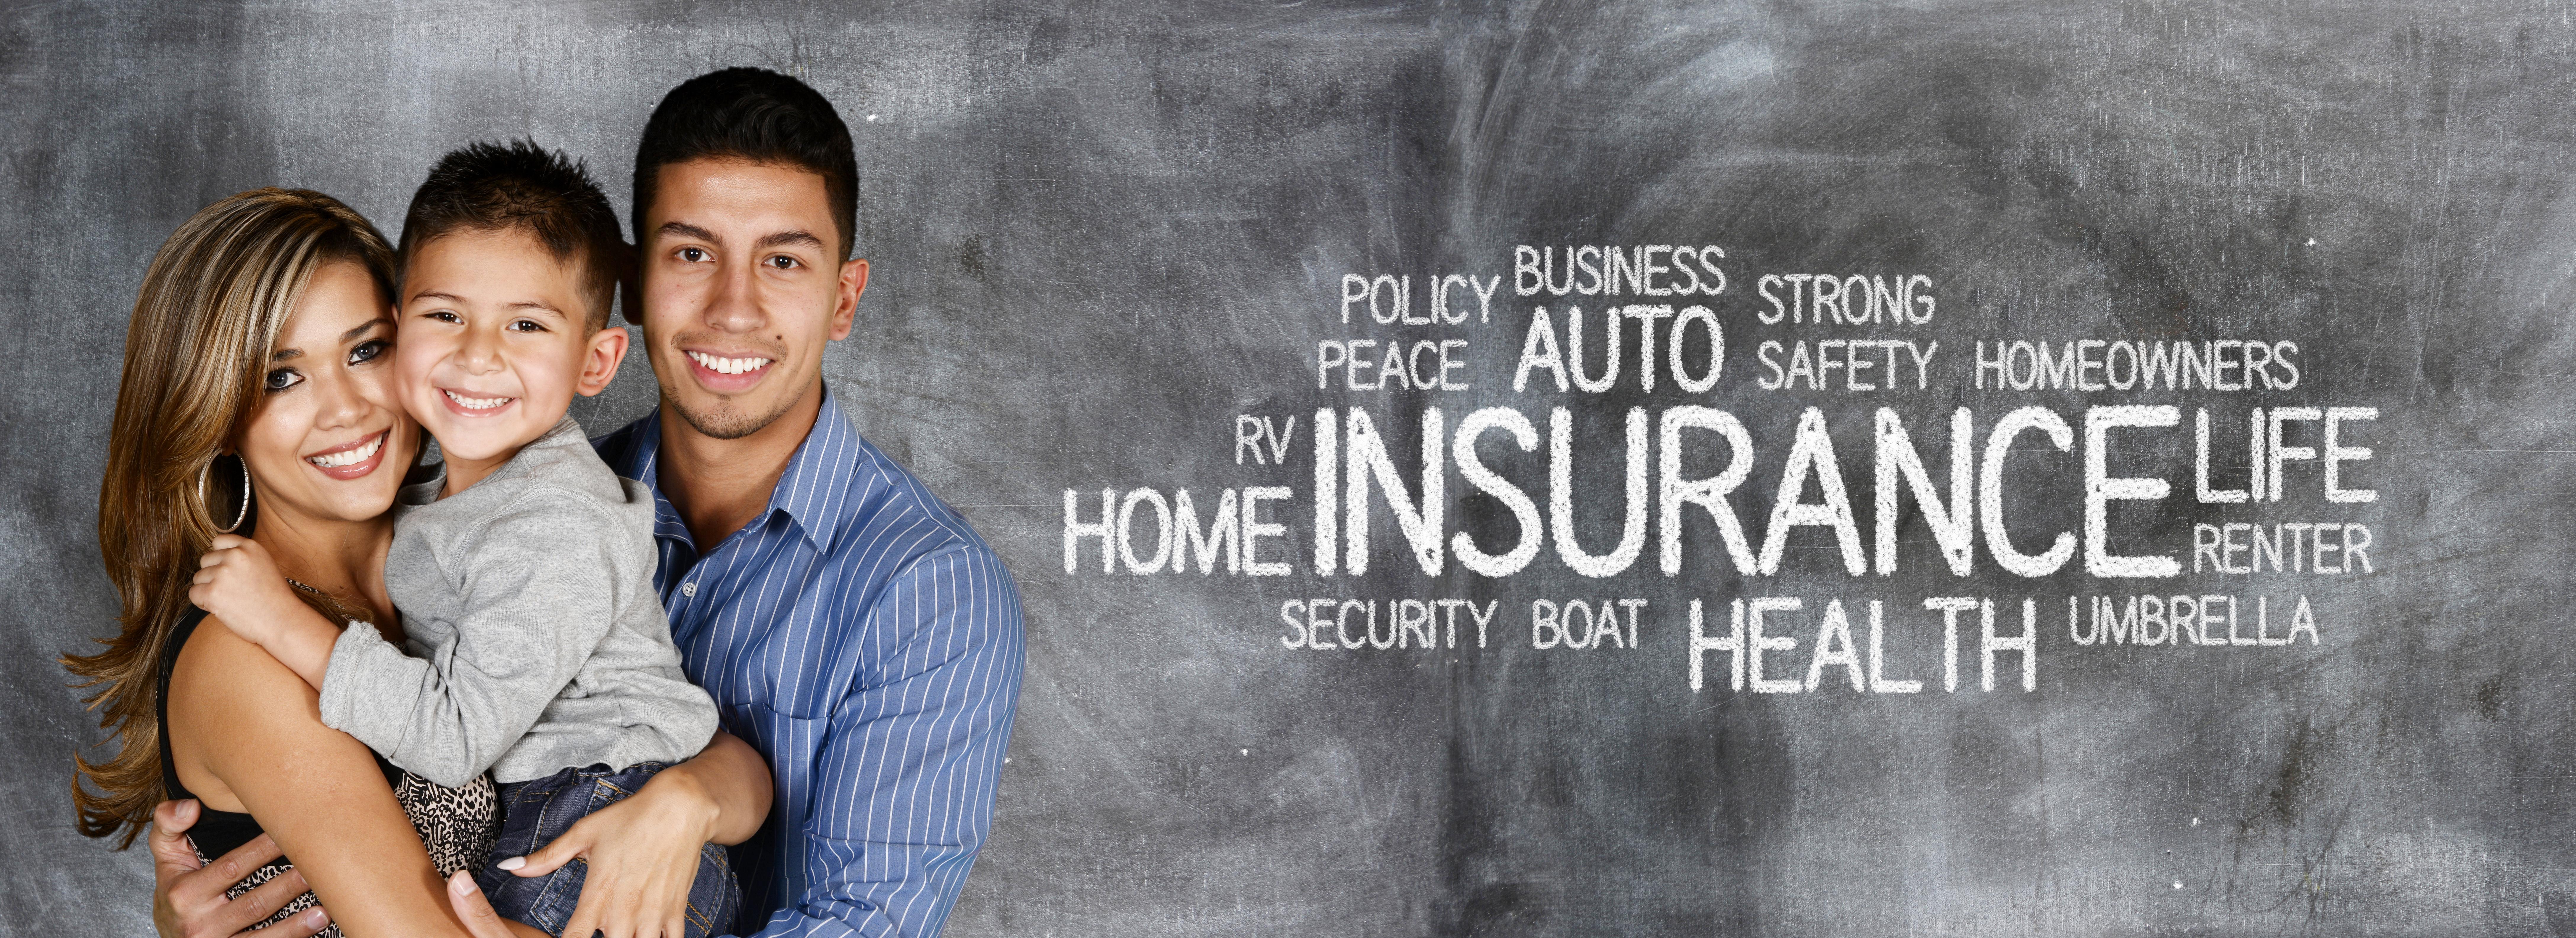 Multi-Unit Insurance Agency-Nationally Branded